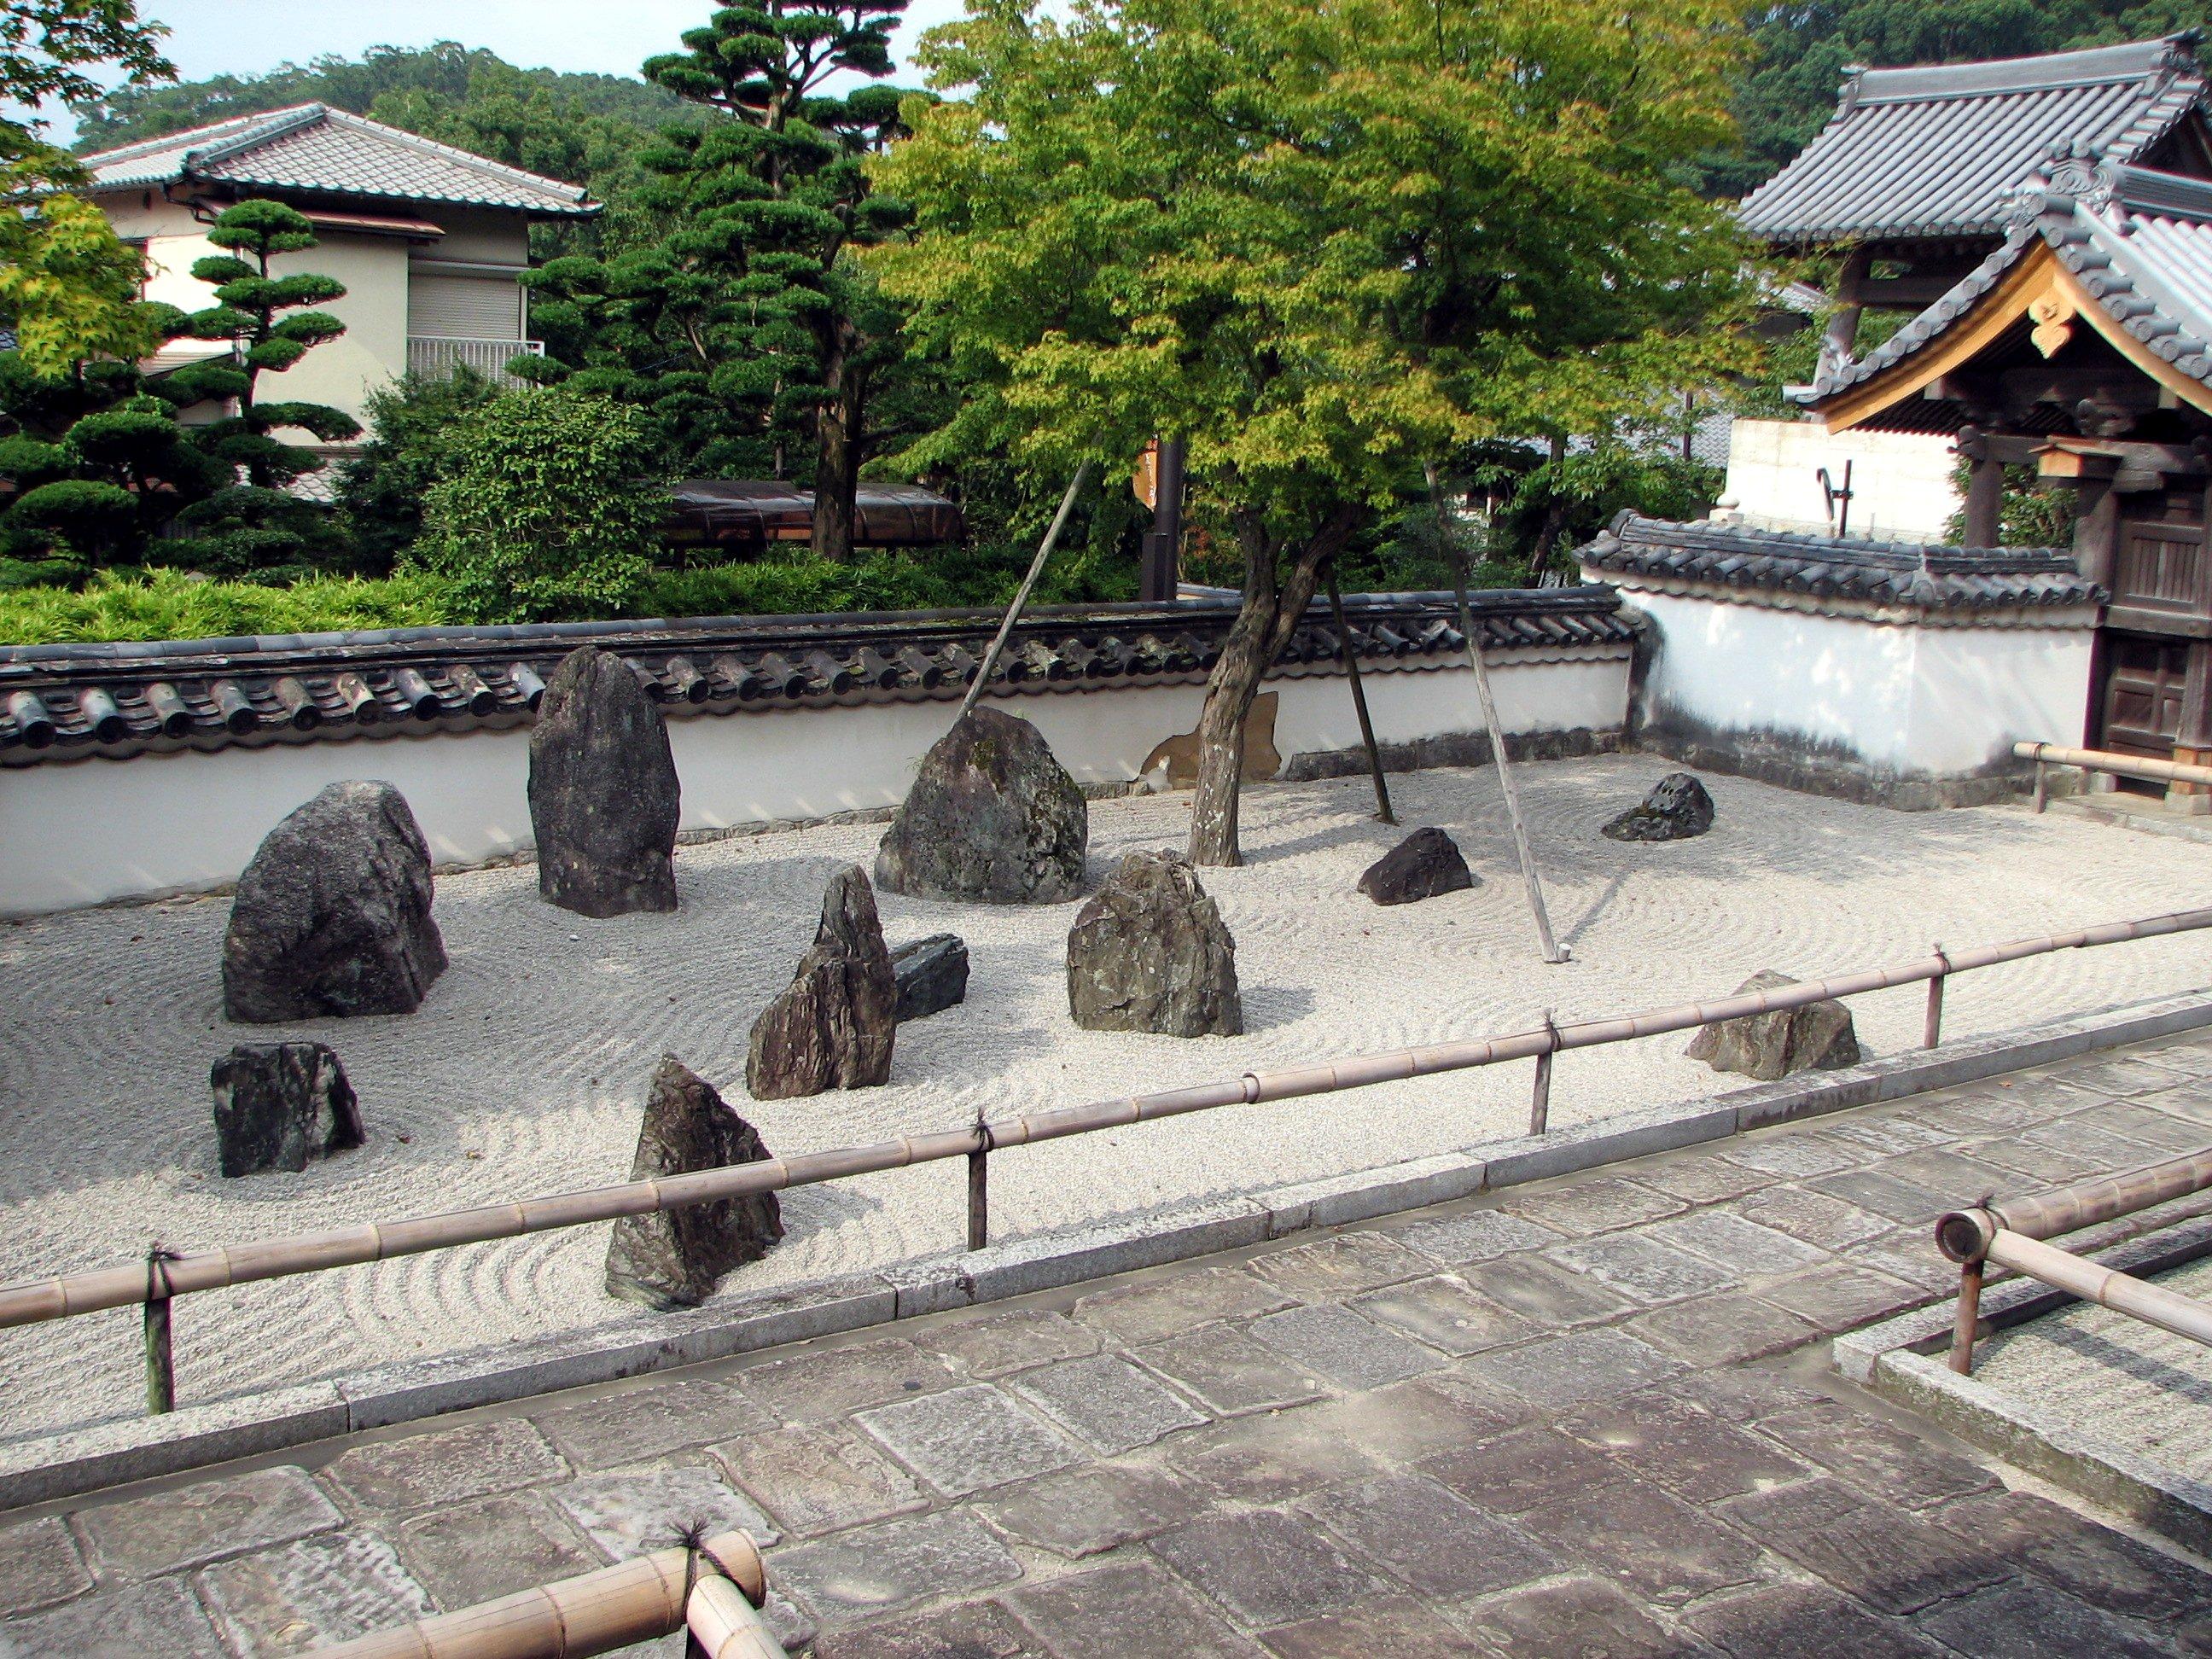 File komyozenji stone garden 2 jpg wikimedia commons for Gardens with rocks and stones